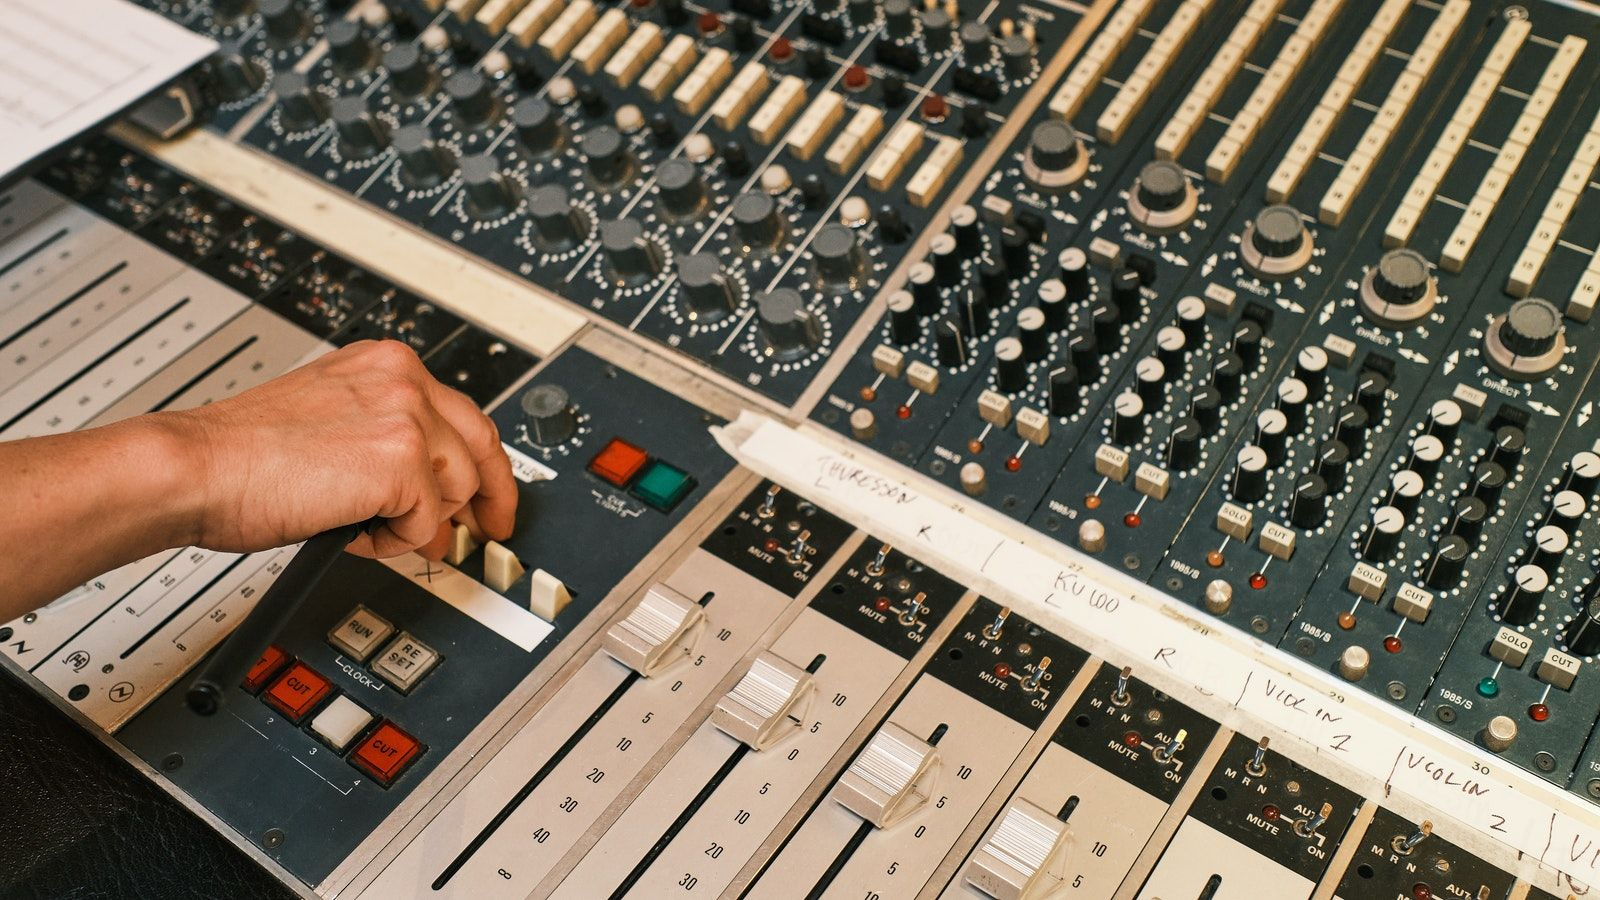 Making Polestar music at Svenska Grammofon Studion